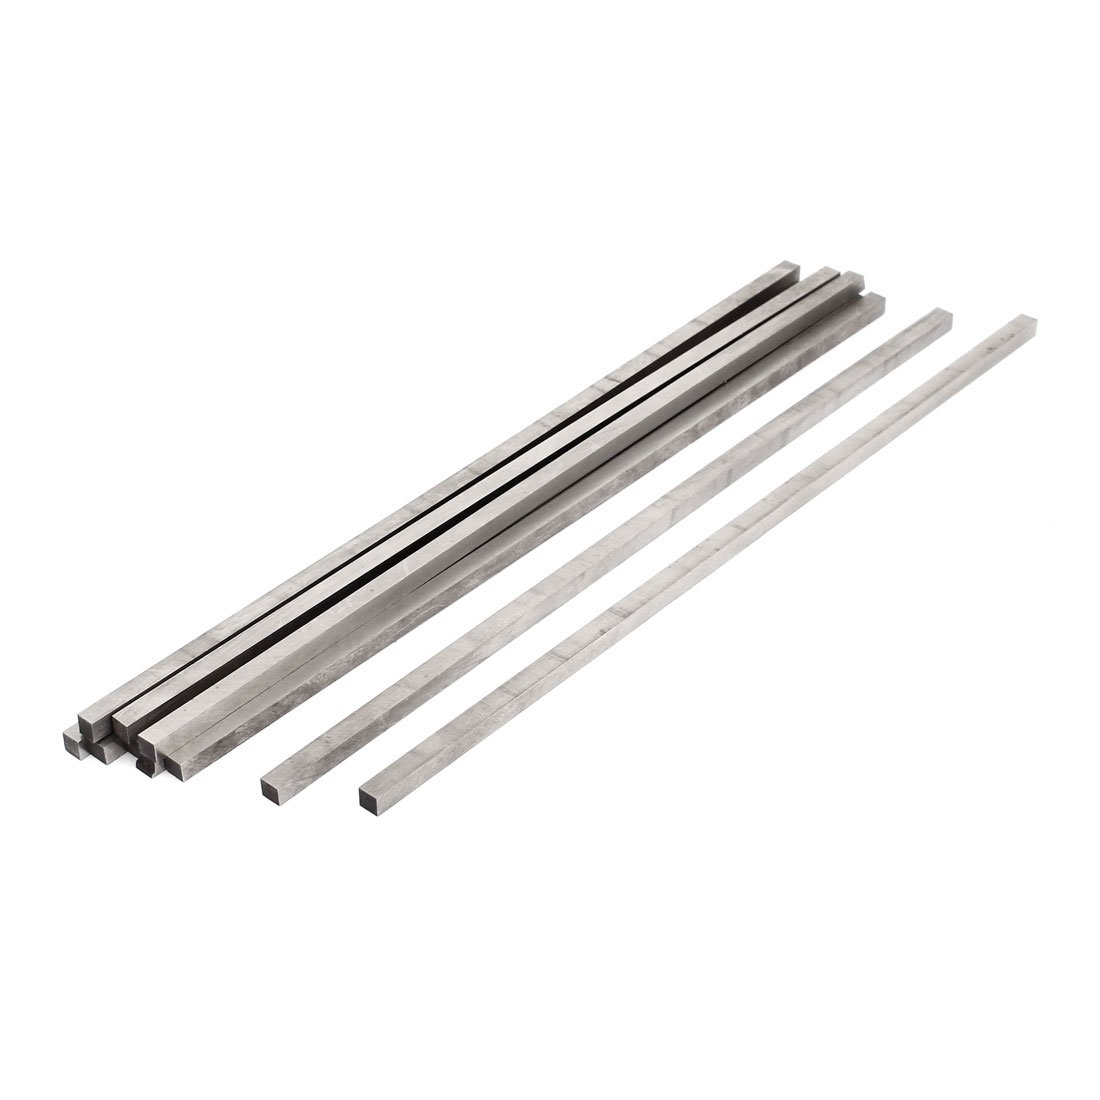 4mm x 10mm x 200mm Silver Tone High Speed Steel Milling Lathe HSS Tool Bit